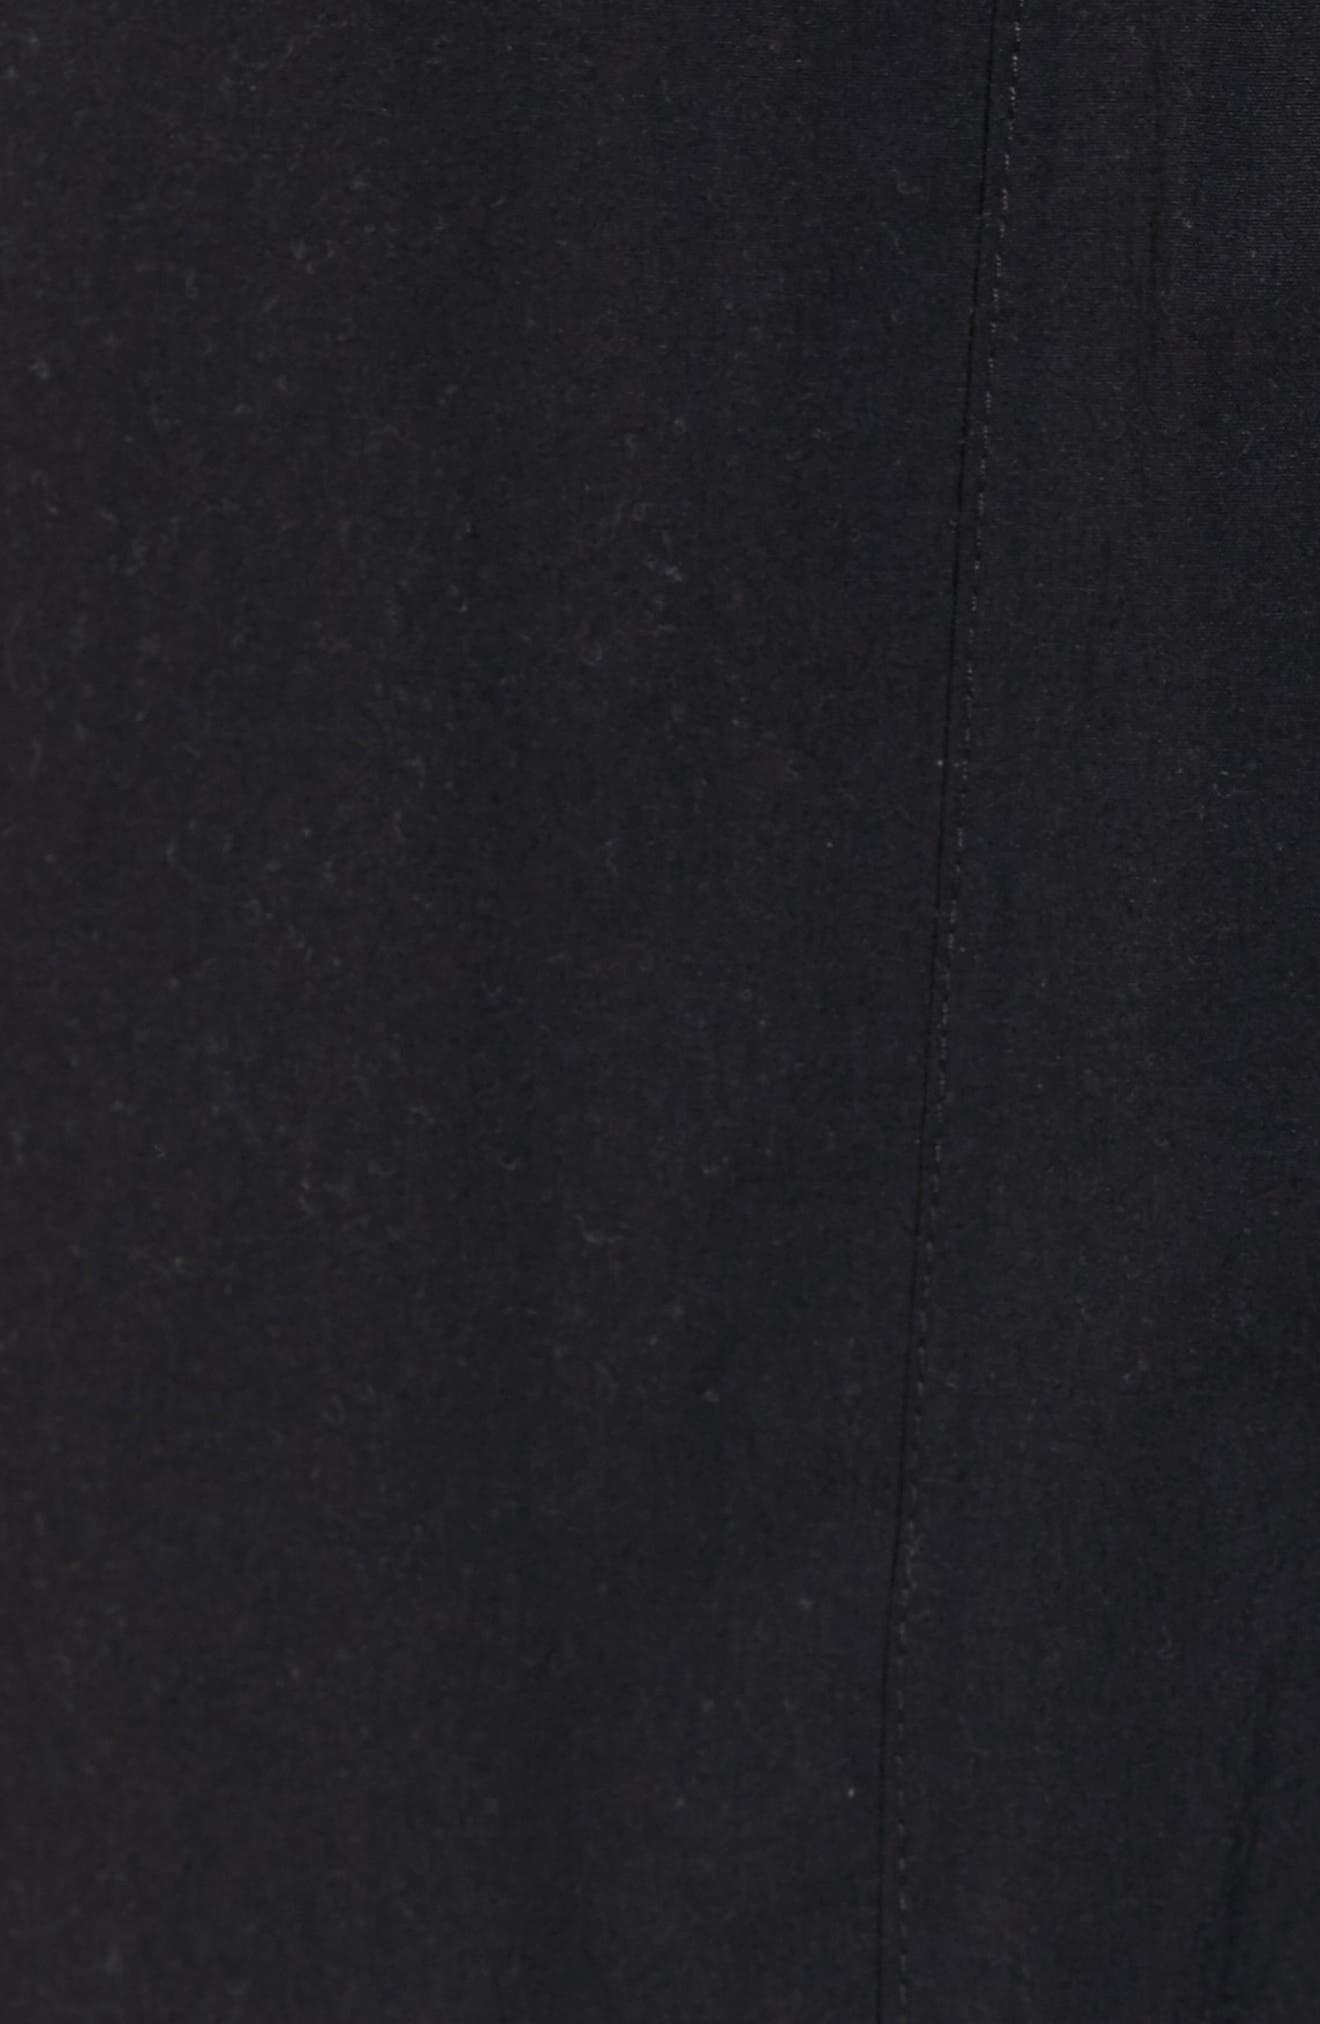 N279 Sweatpants,                             Alternate thumbnail 5, color,                             001